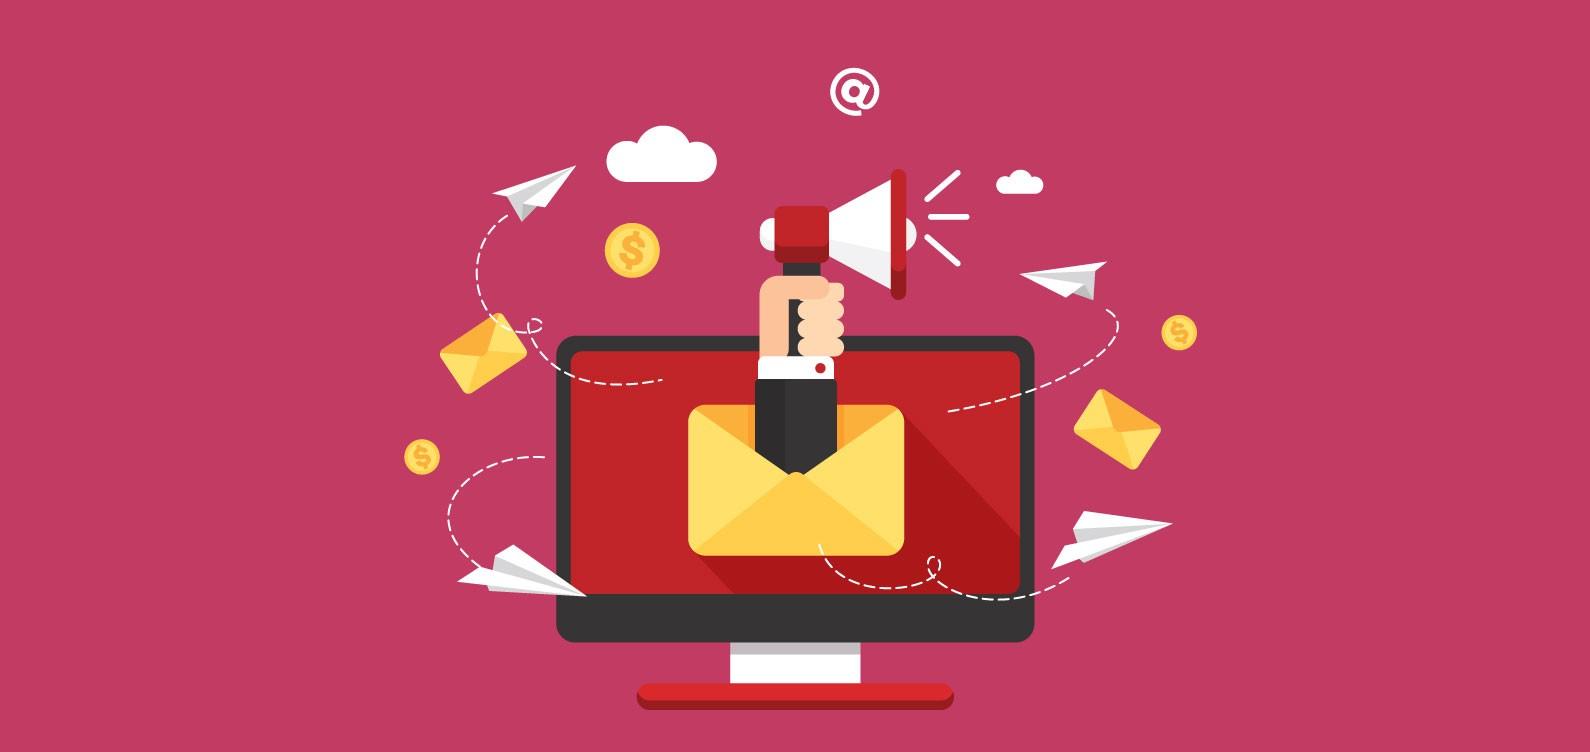 E-mail Marketing Services Hero Image